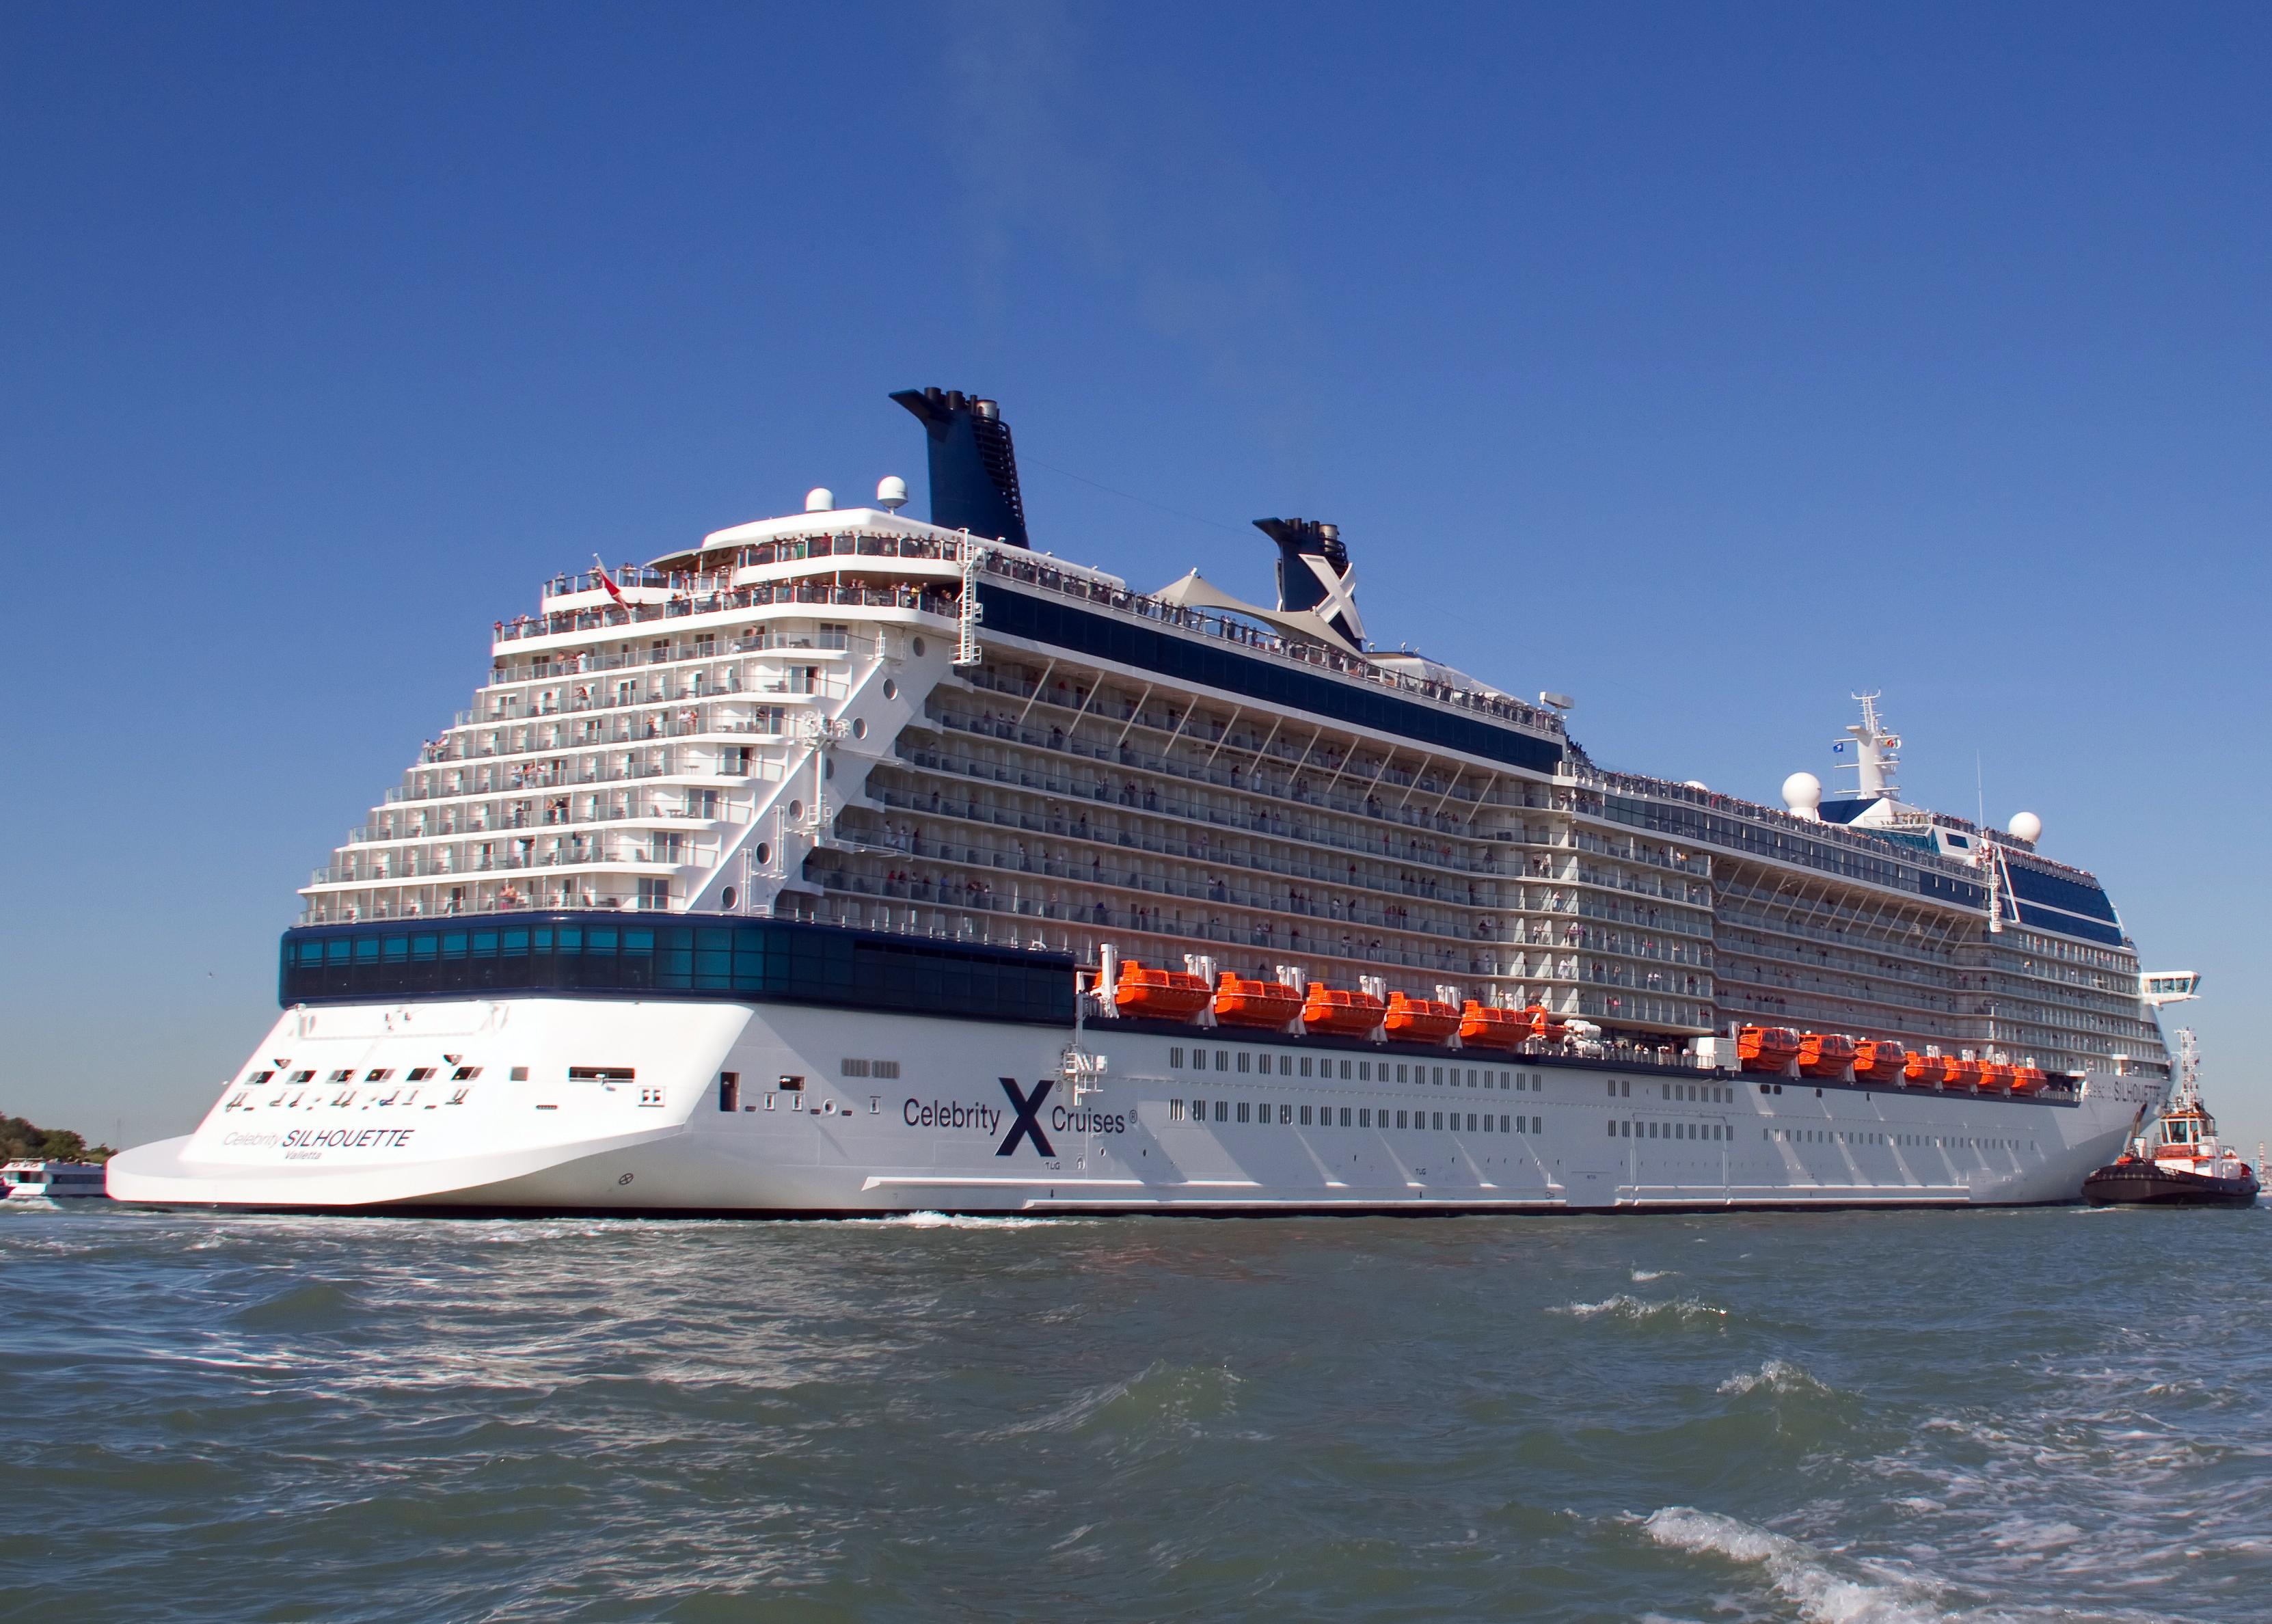 Beschreibung celebrity silhouette ship 2011 001